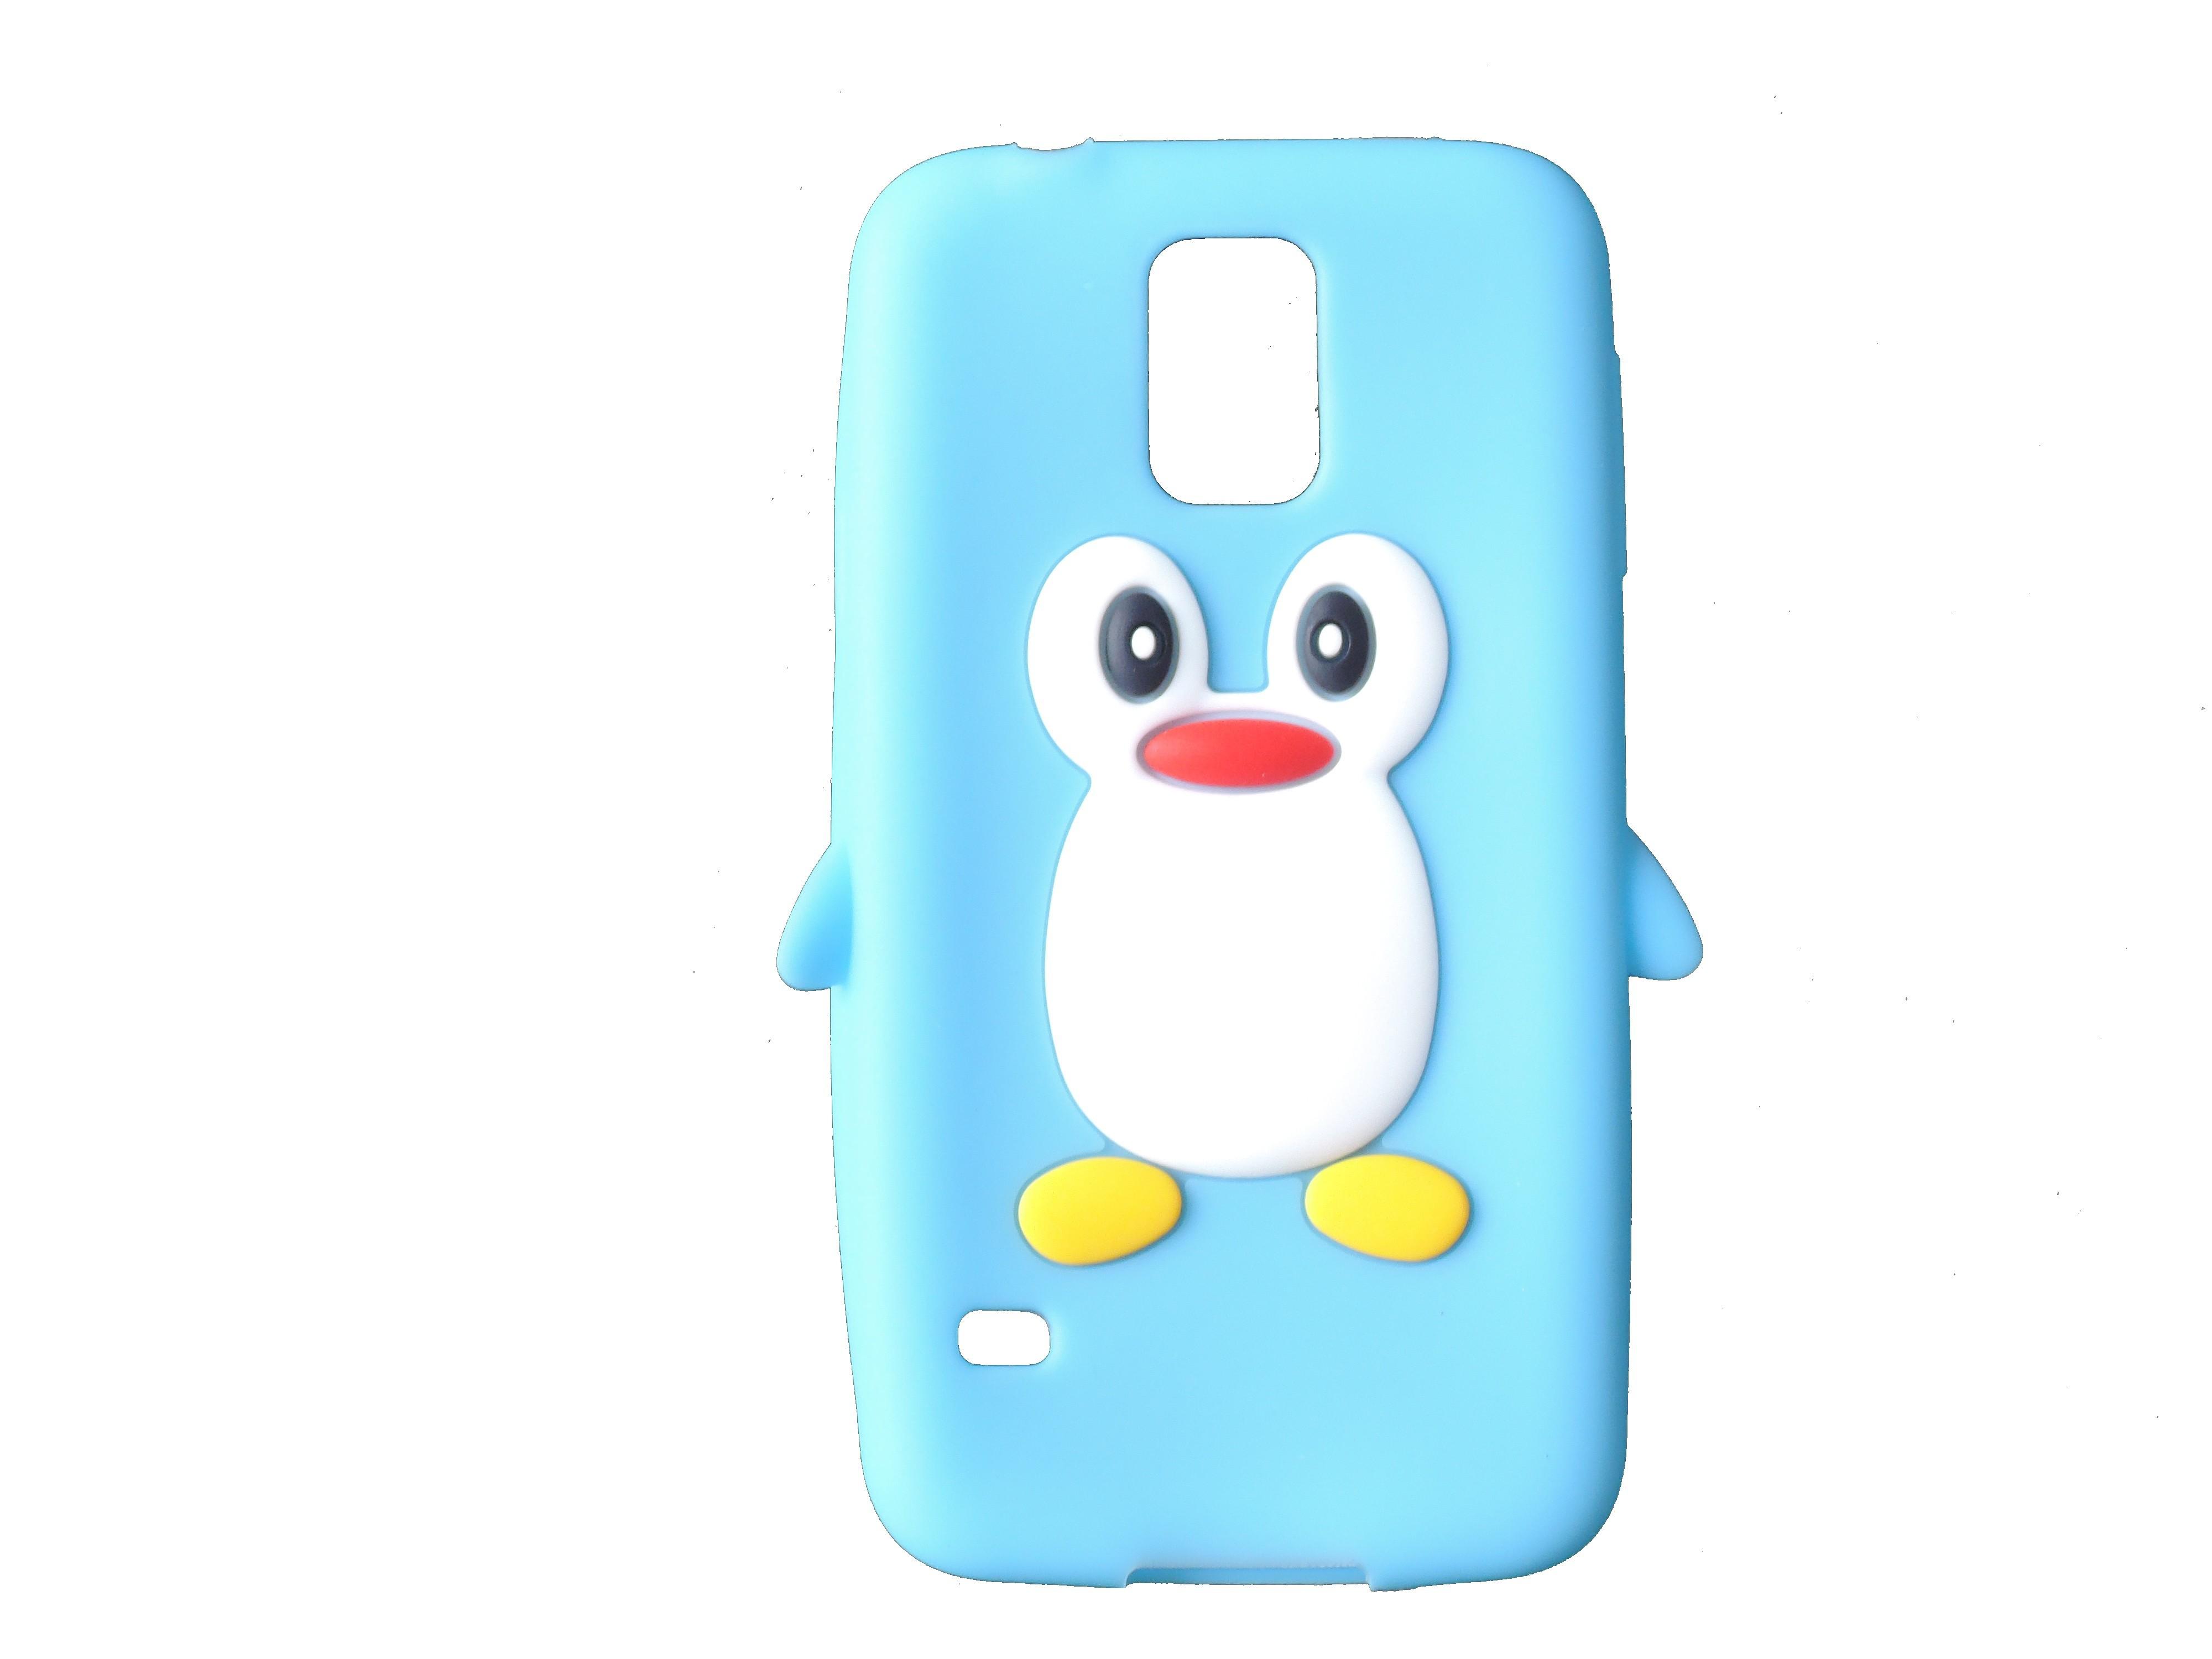 Coque TPU Samsung Galaxy S5 G900 pingouin bleu turquoise